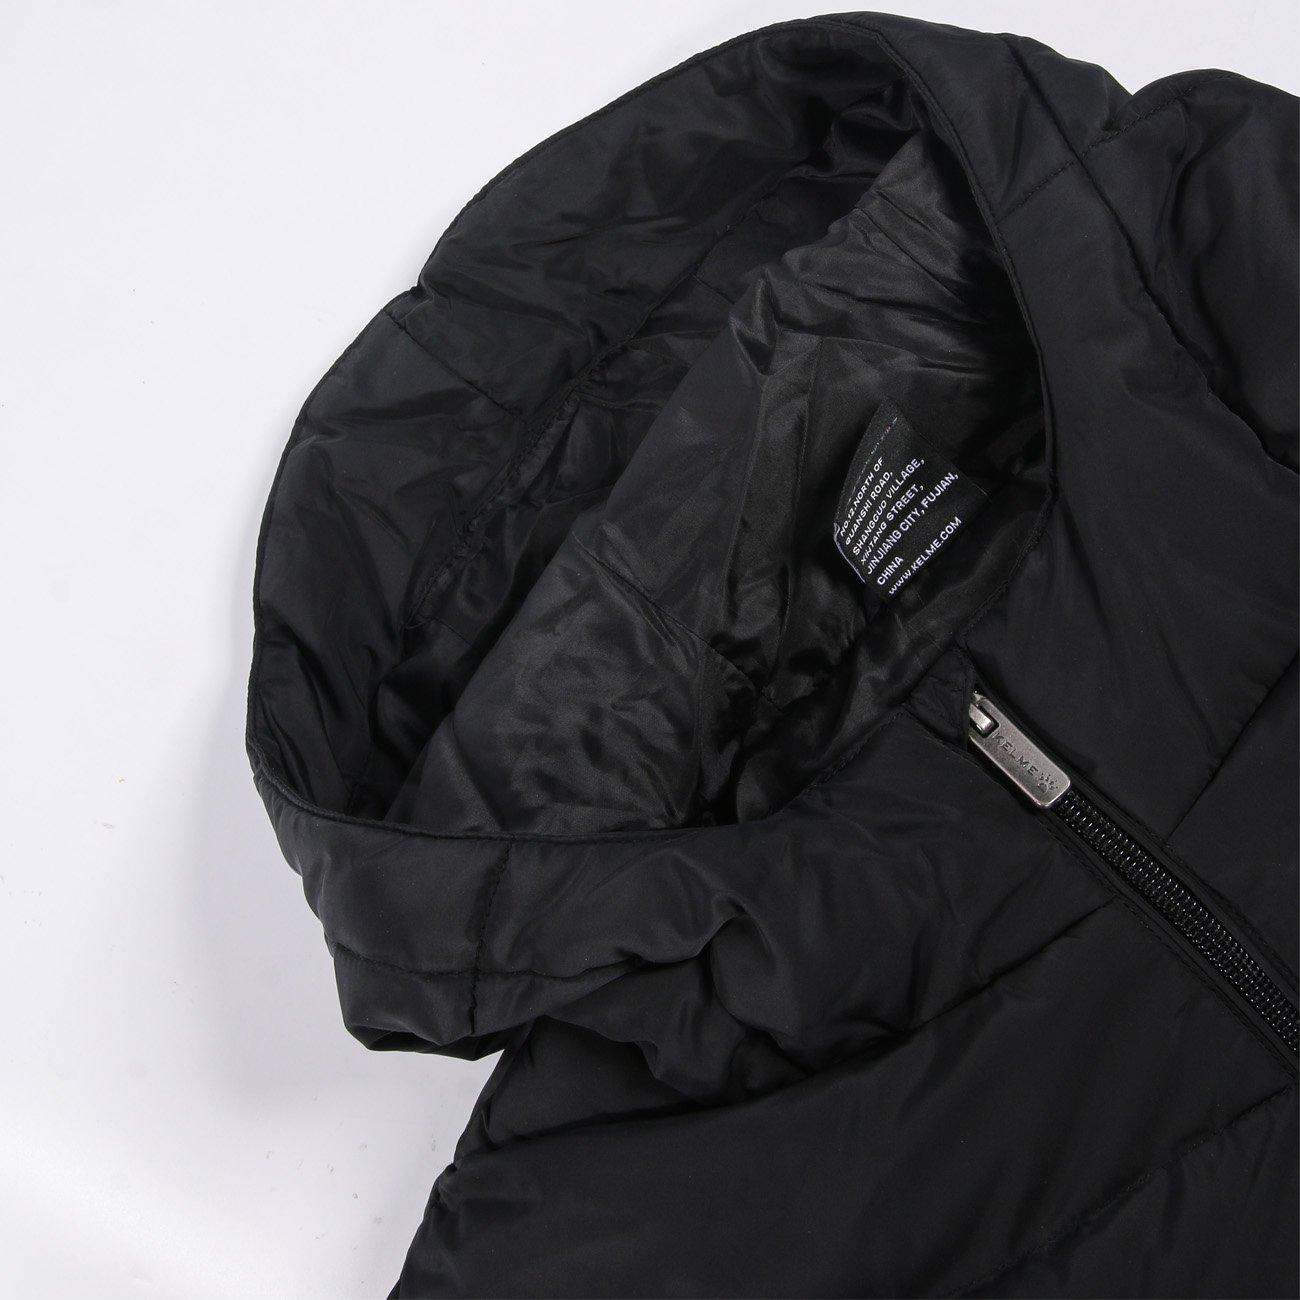 KELME Hombre Chaqueta Abrigo Resistente al Viento Coat ...